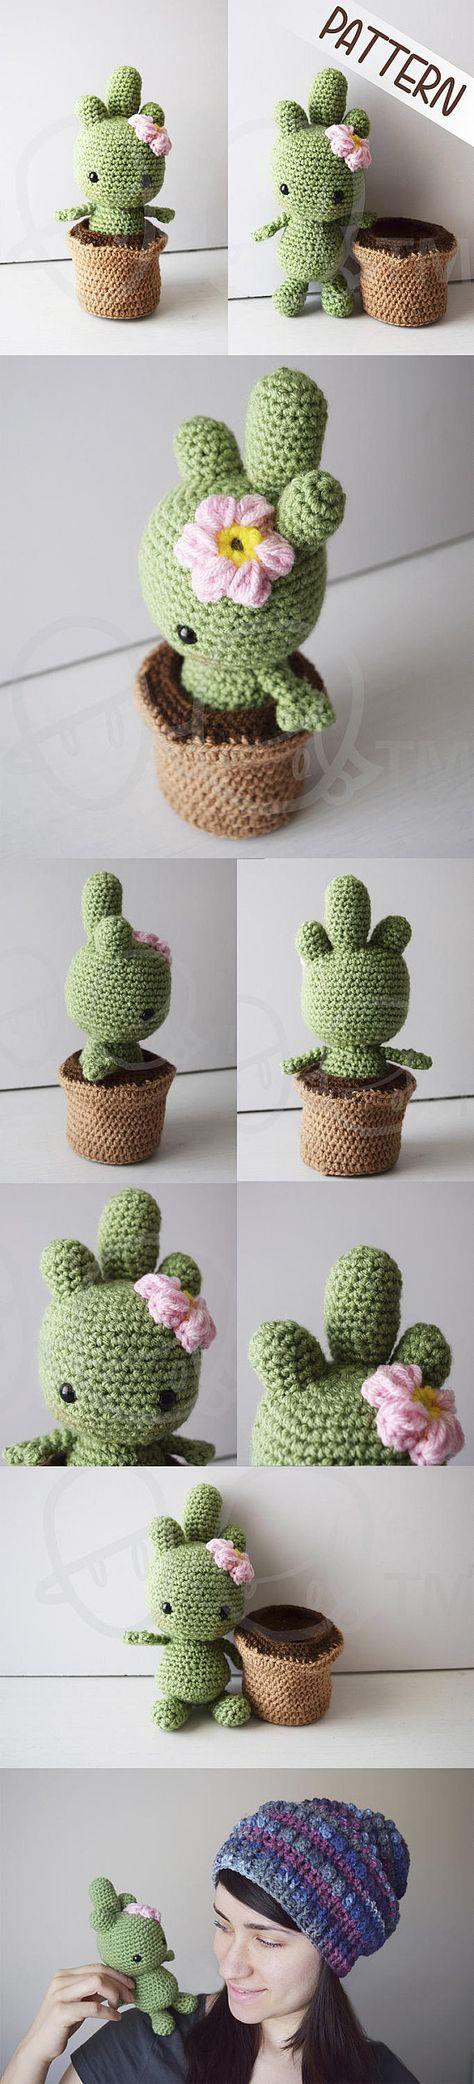 Amigurumi Crochet Crocheted video game mushrooms (amigurumi ... | 2084x474